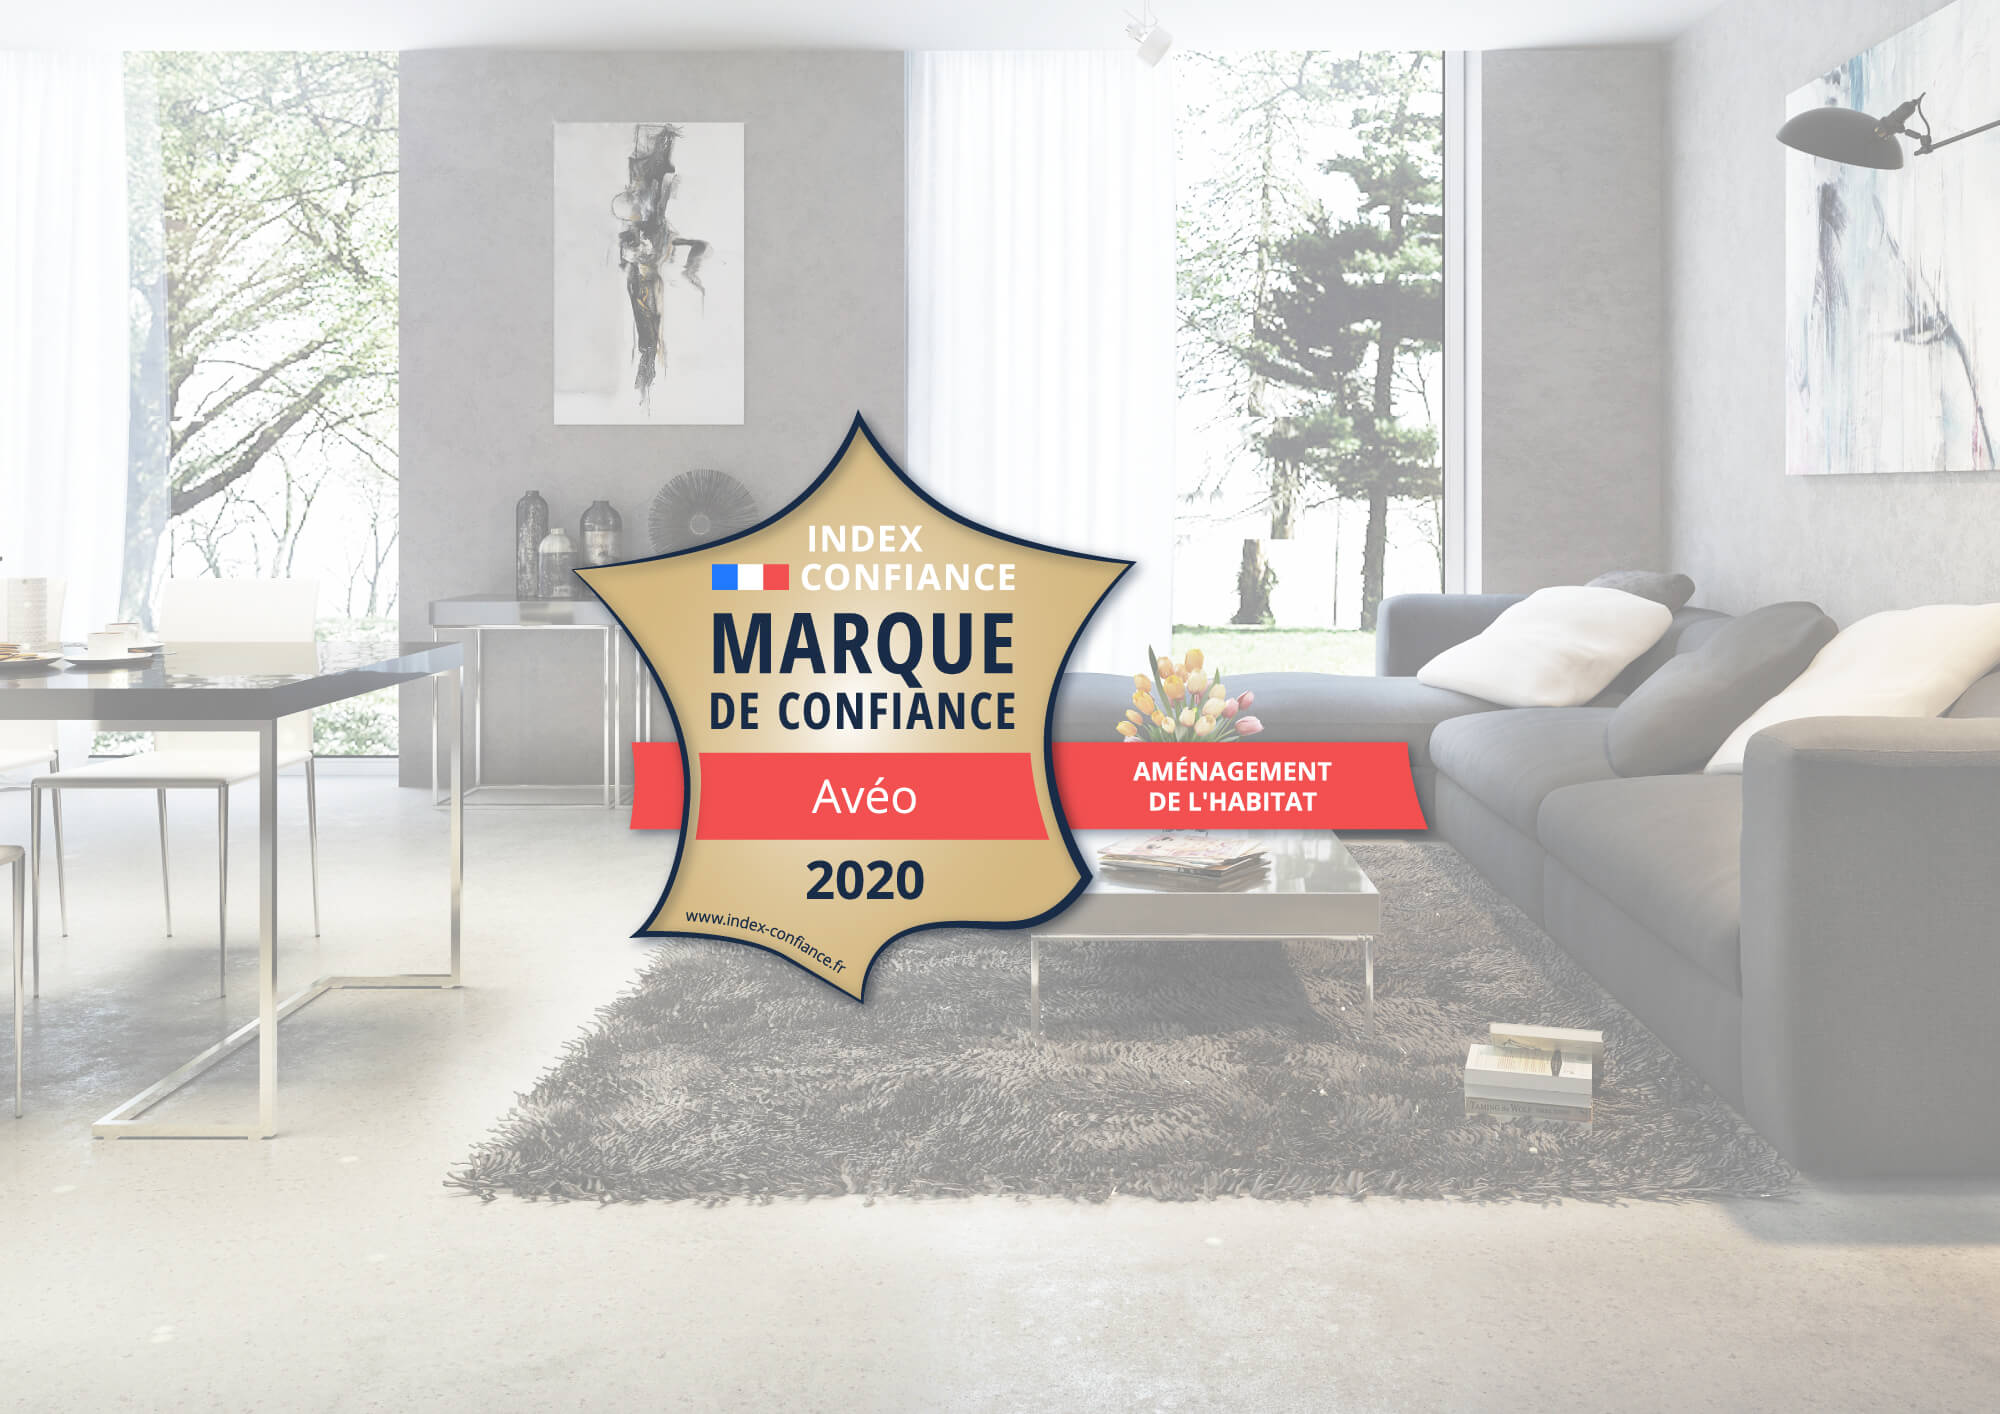 Avéo reconnu Index Marque Confiance 2020 Statista